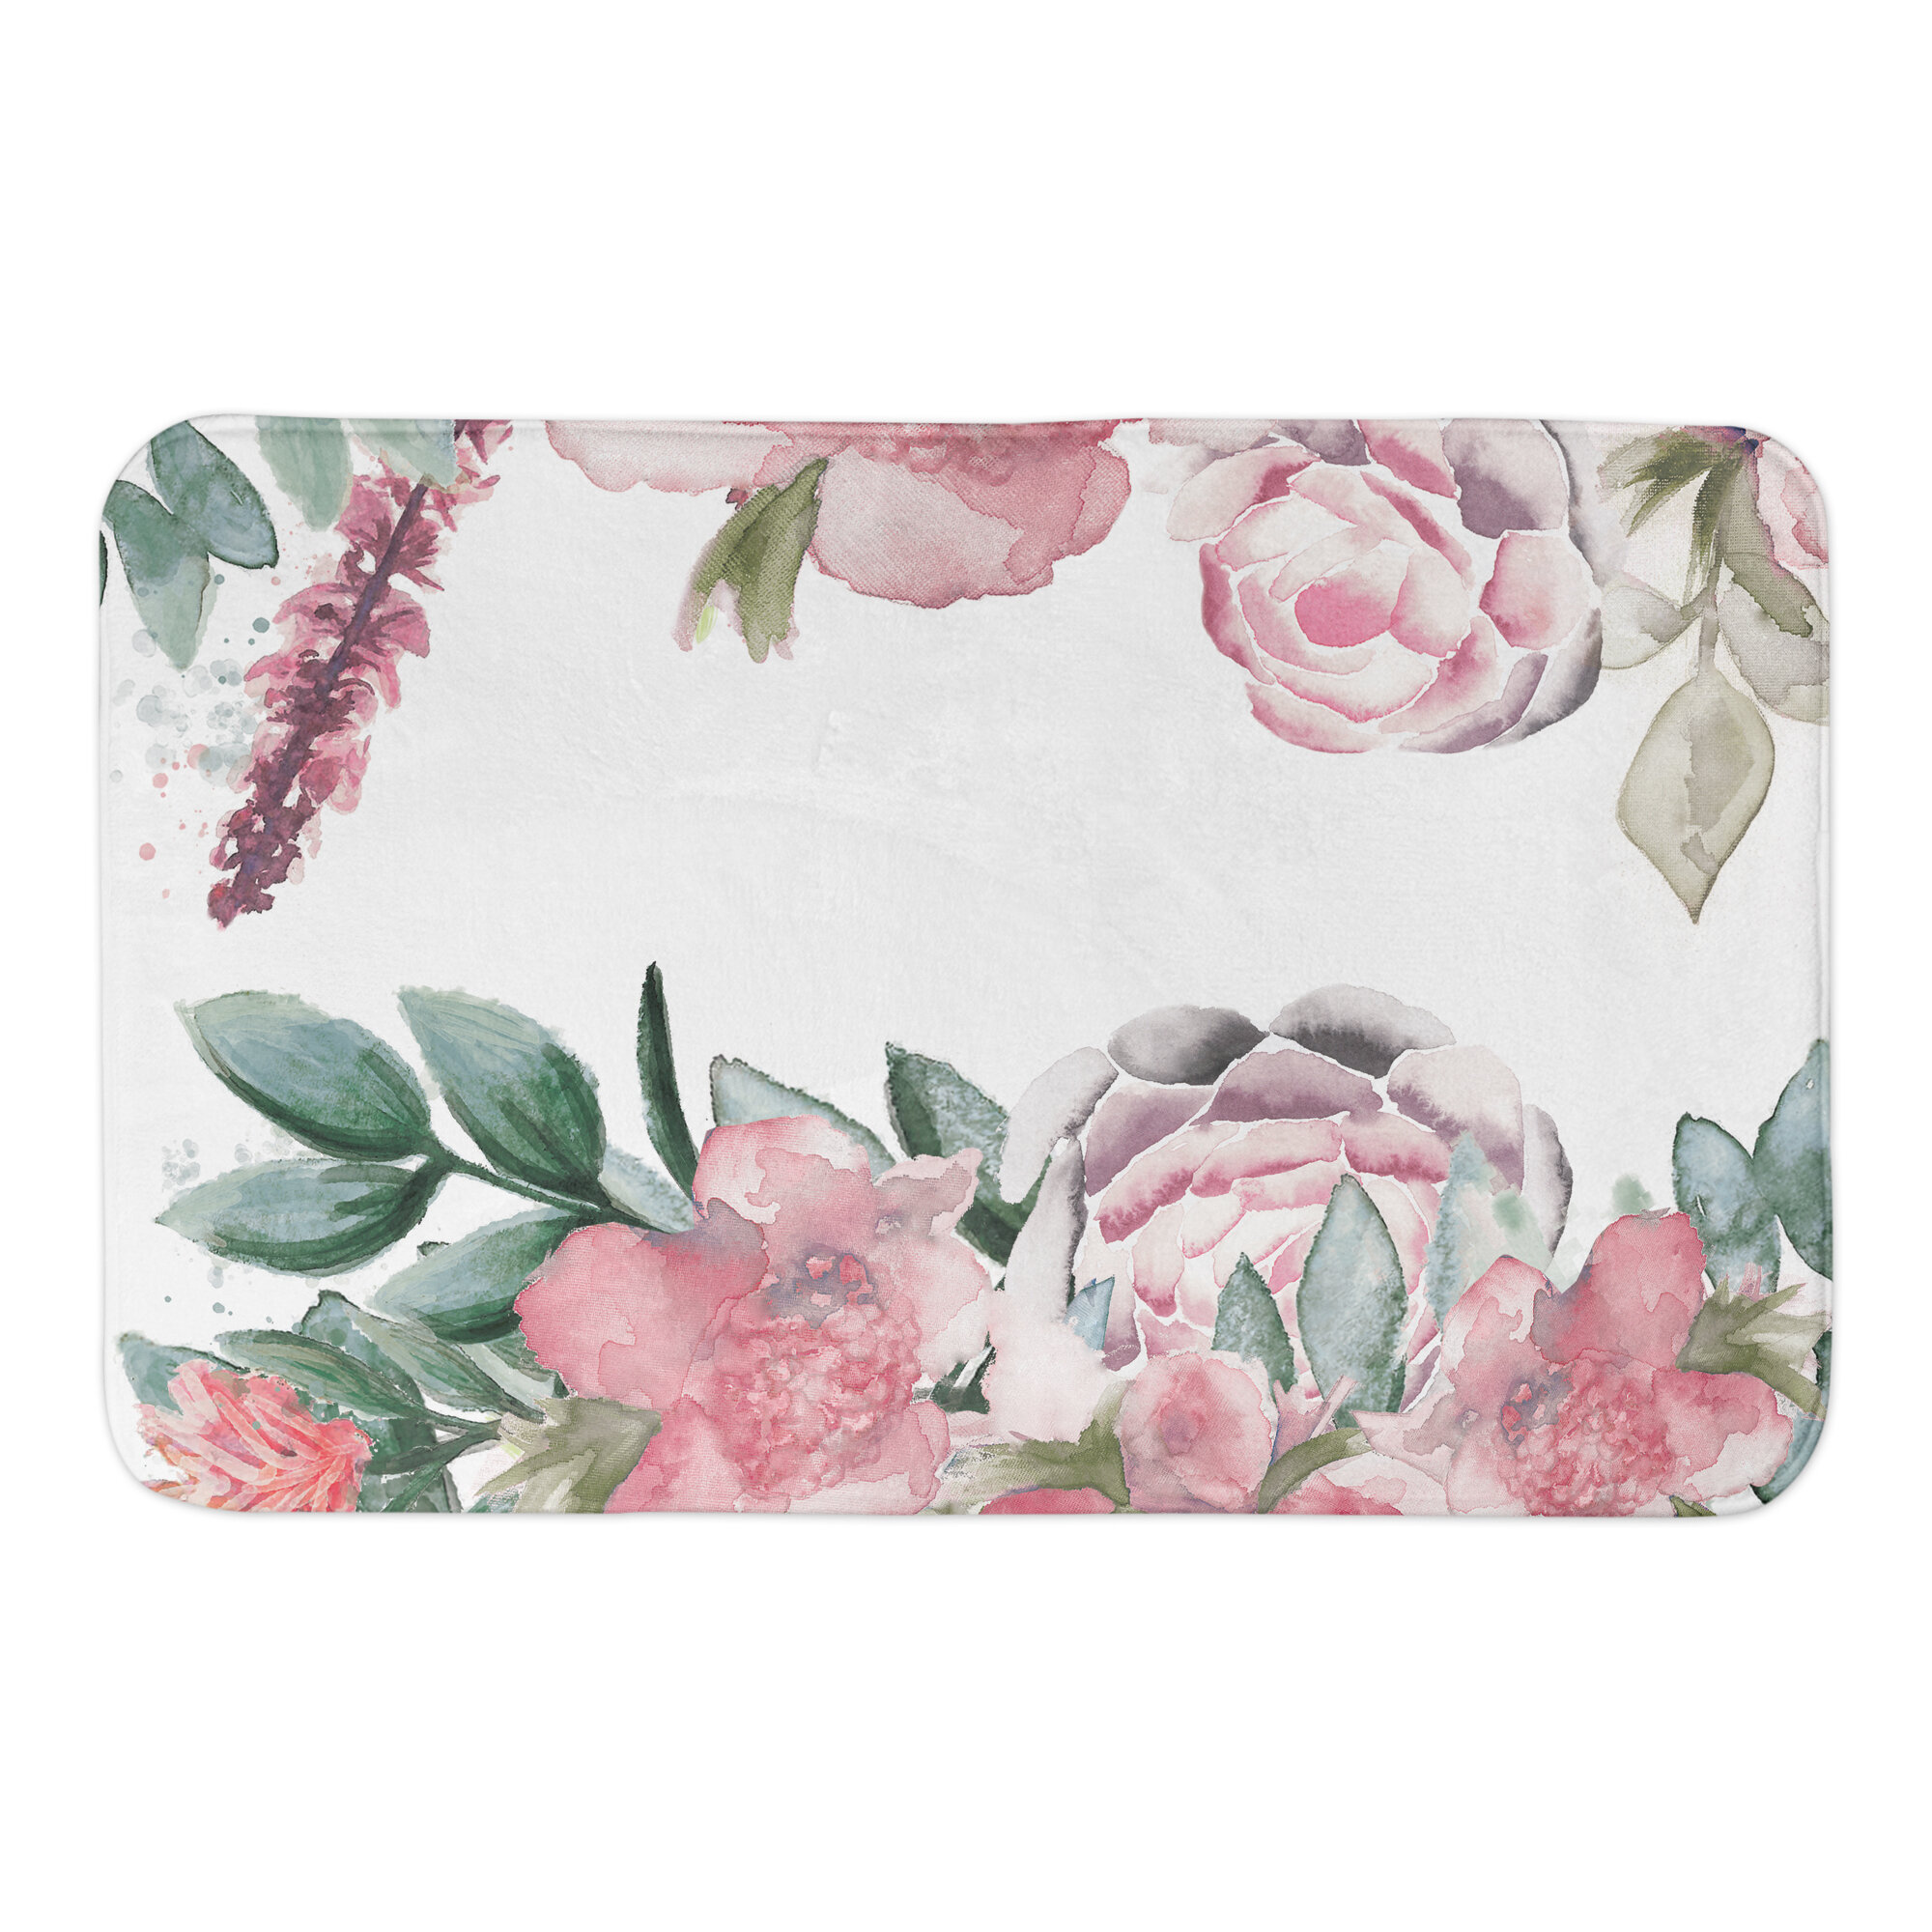 Bungalow Rose Florencio Botanicals Rectangle Non Slip Floral Bath Rug Wayfair